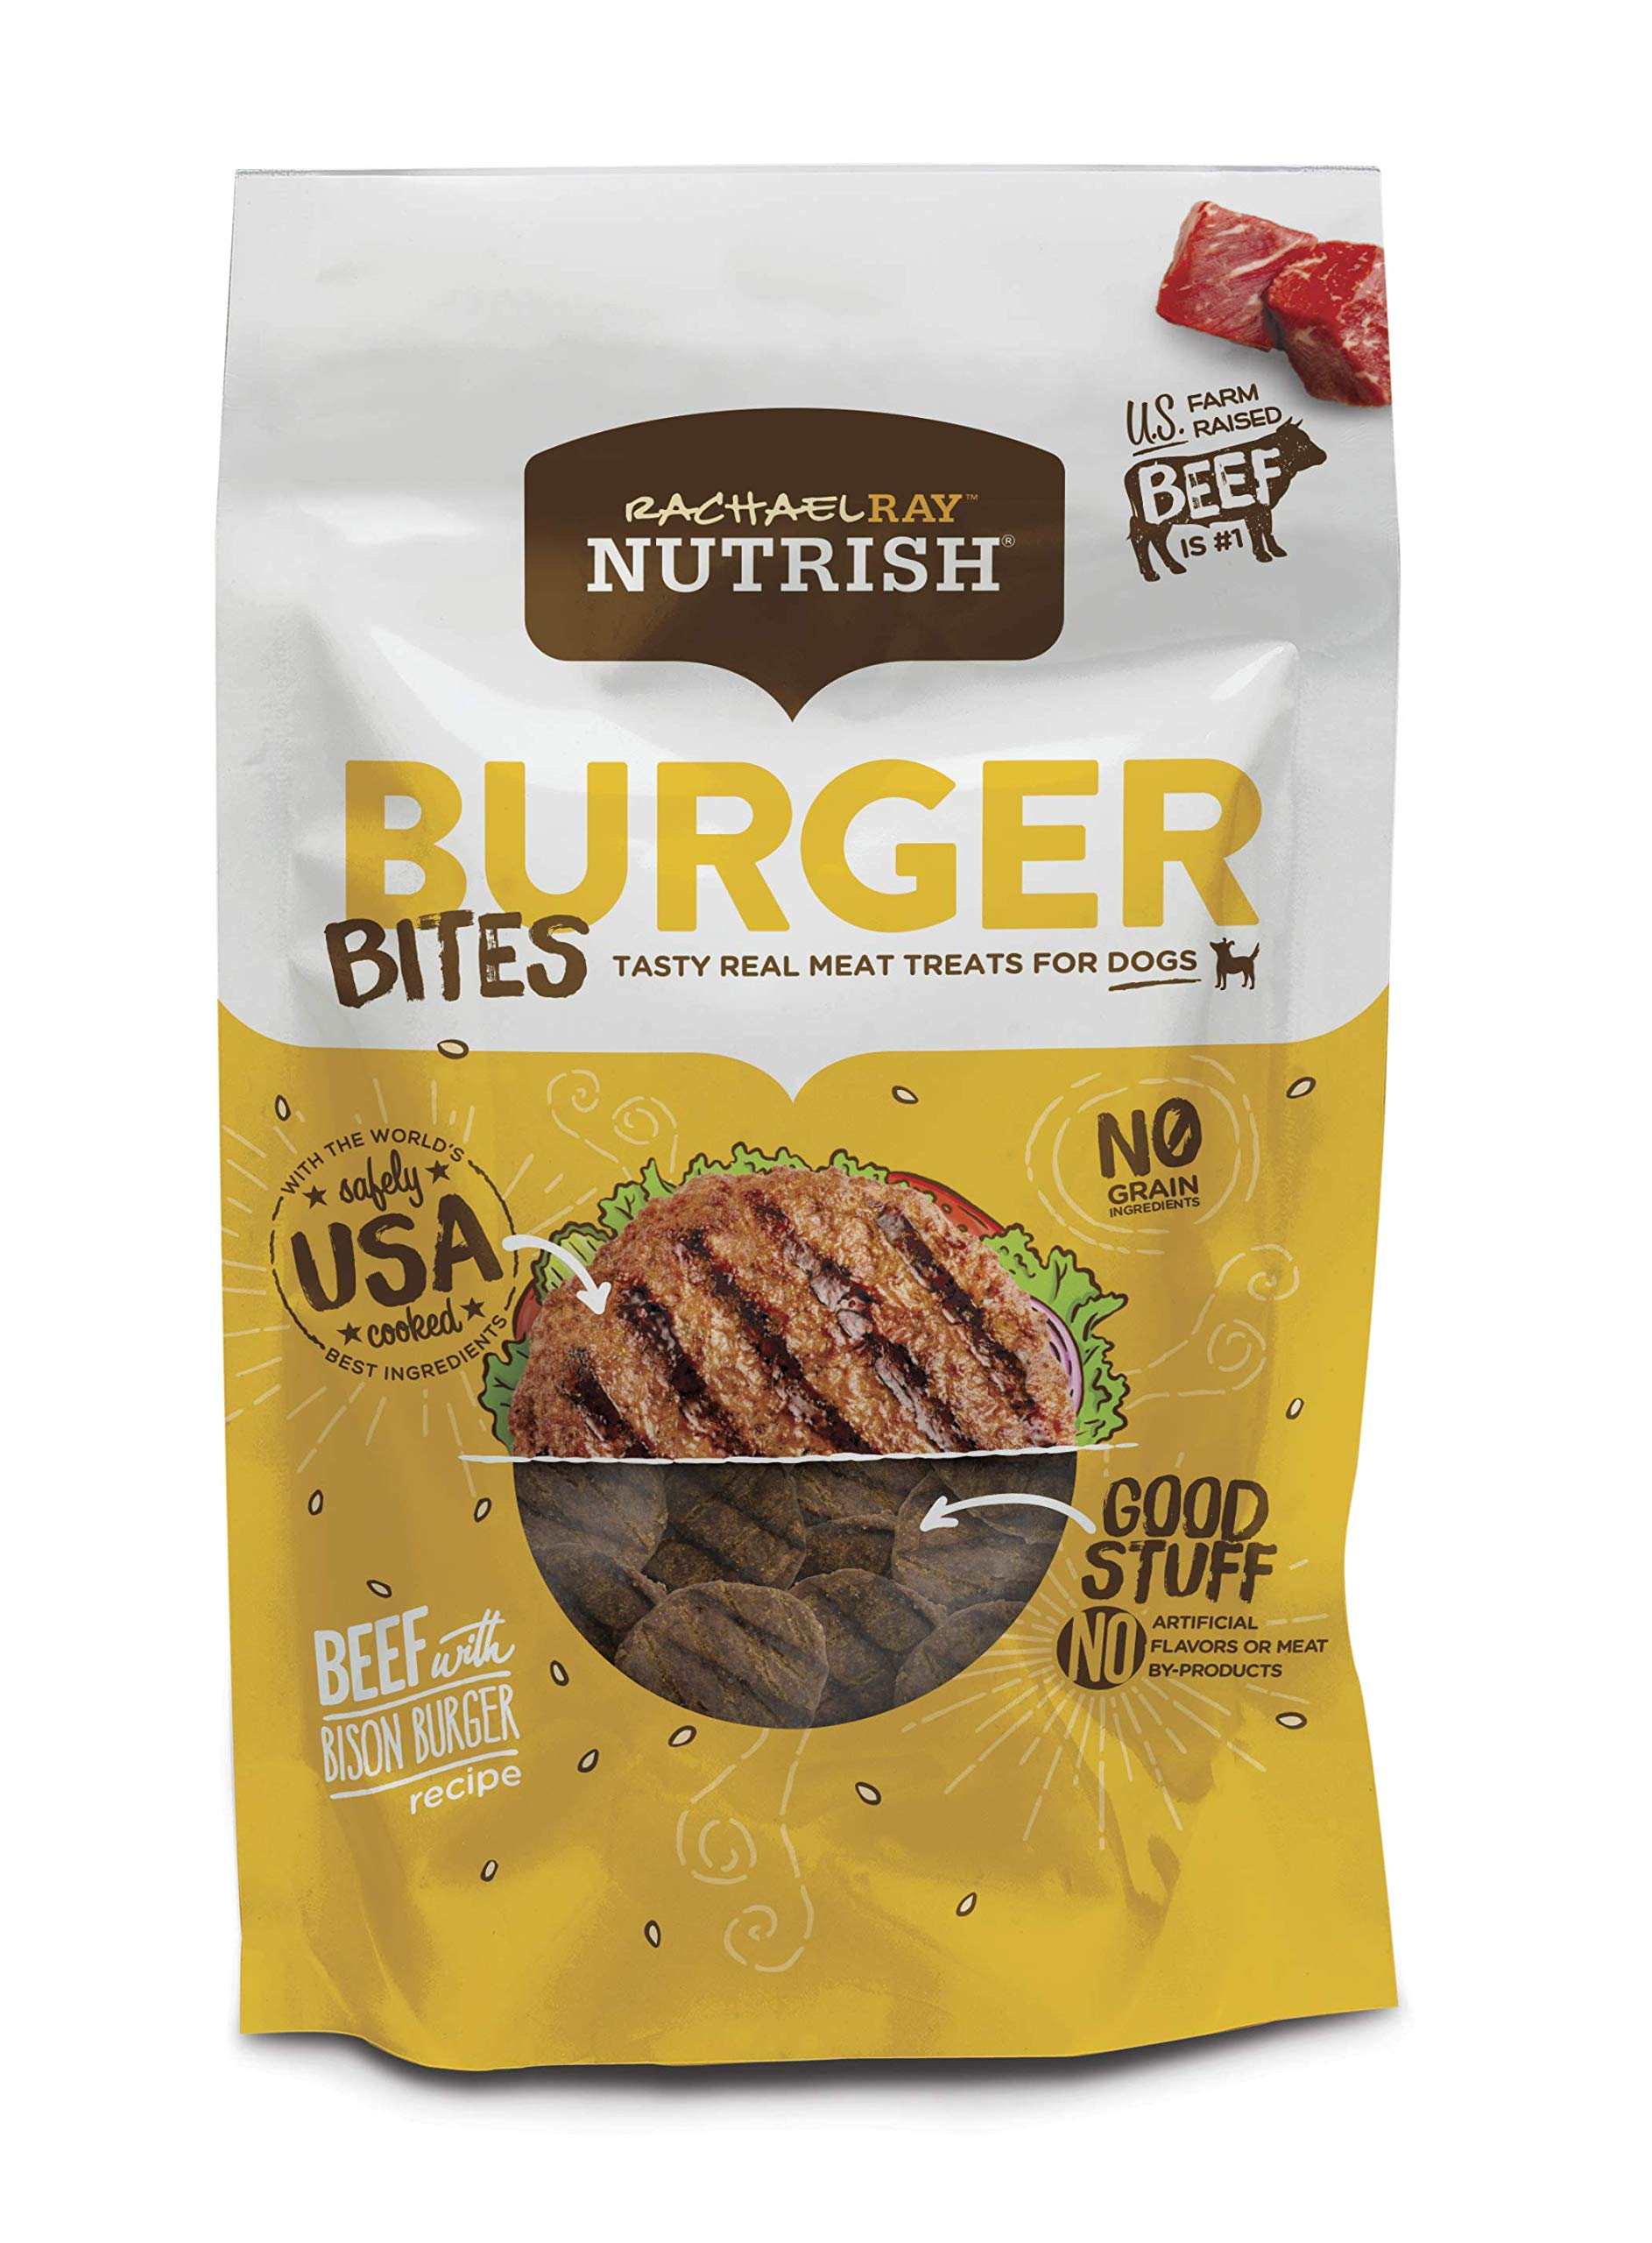 Rachael Ray Nutrish Burger Bites Dog Treats, Beef Burger With Bison Recipe, 12 Oz